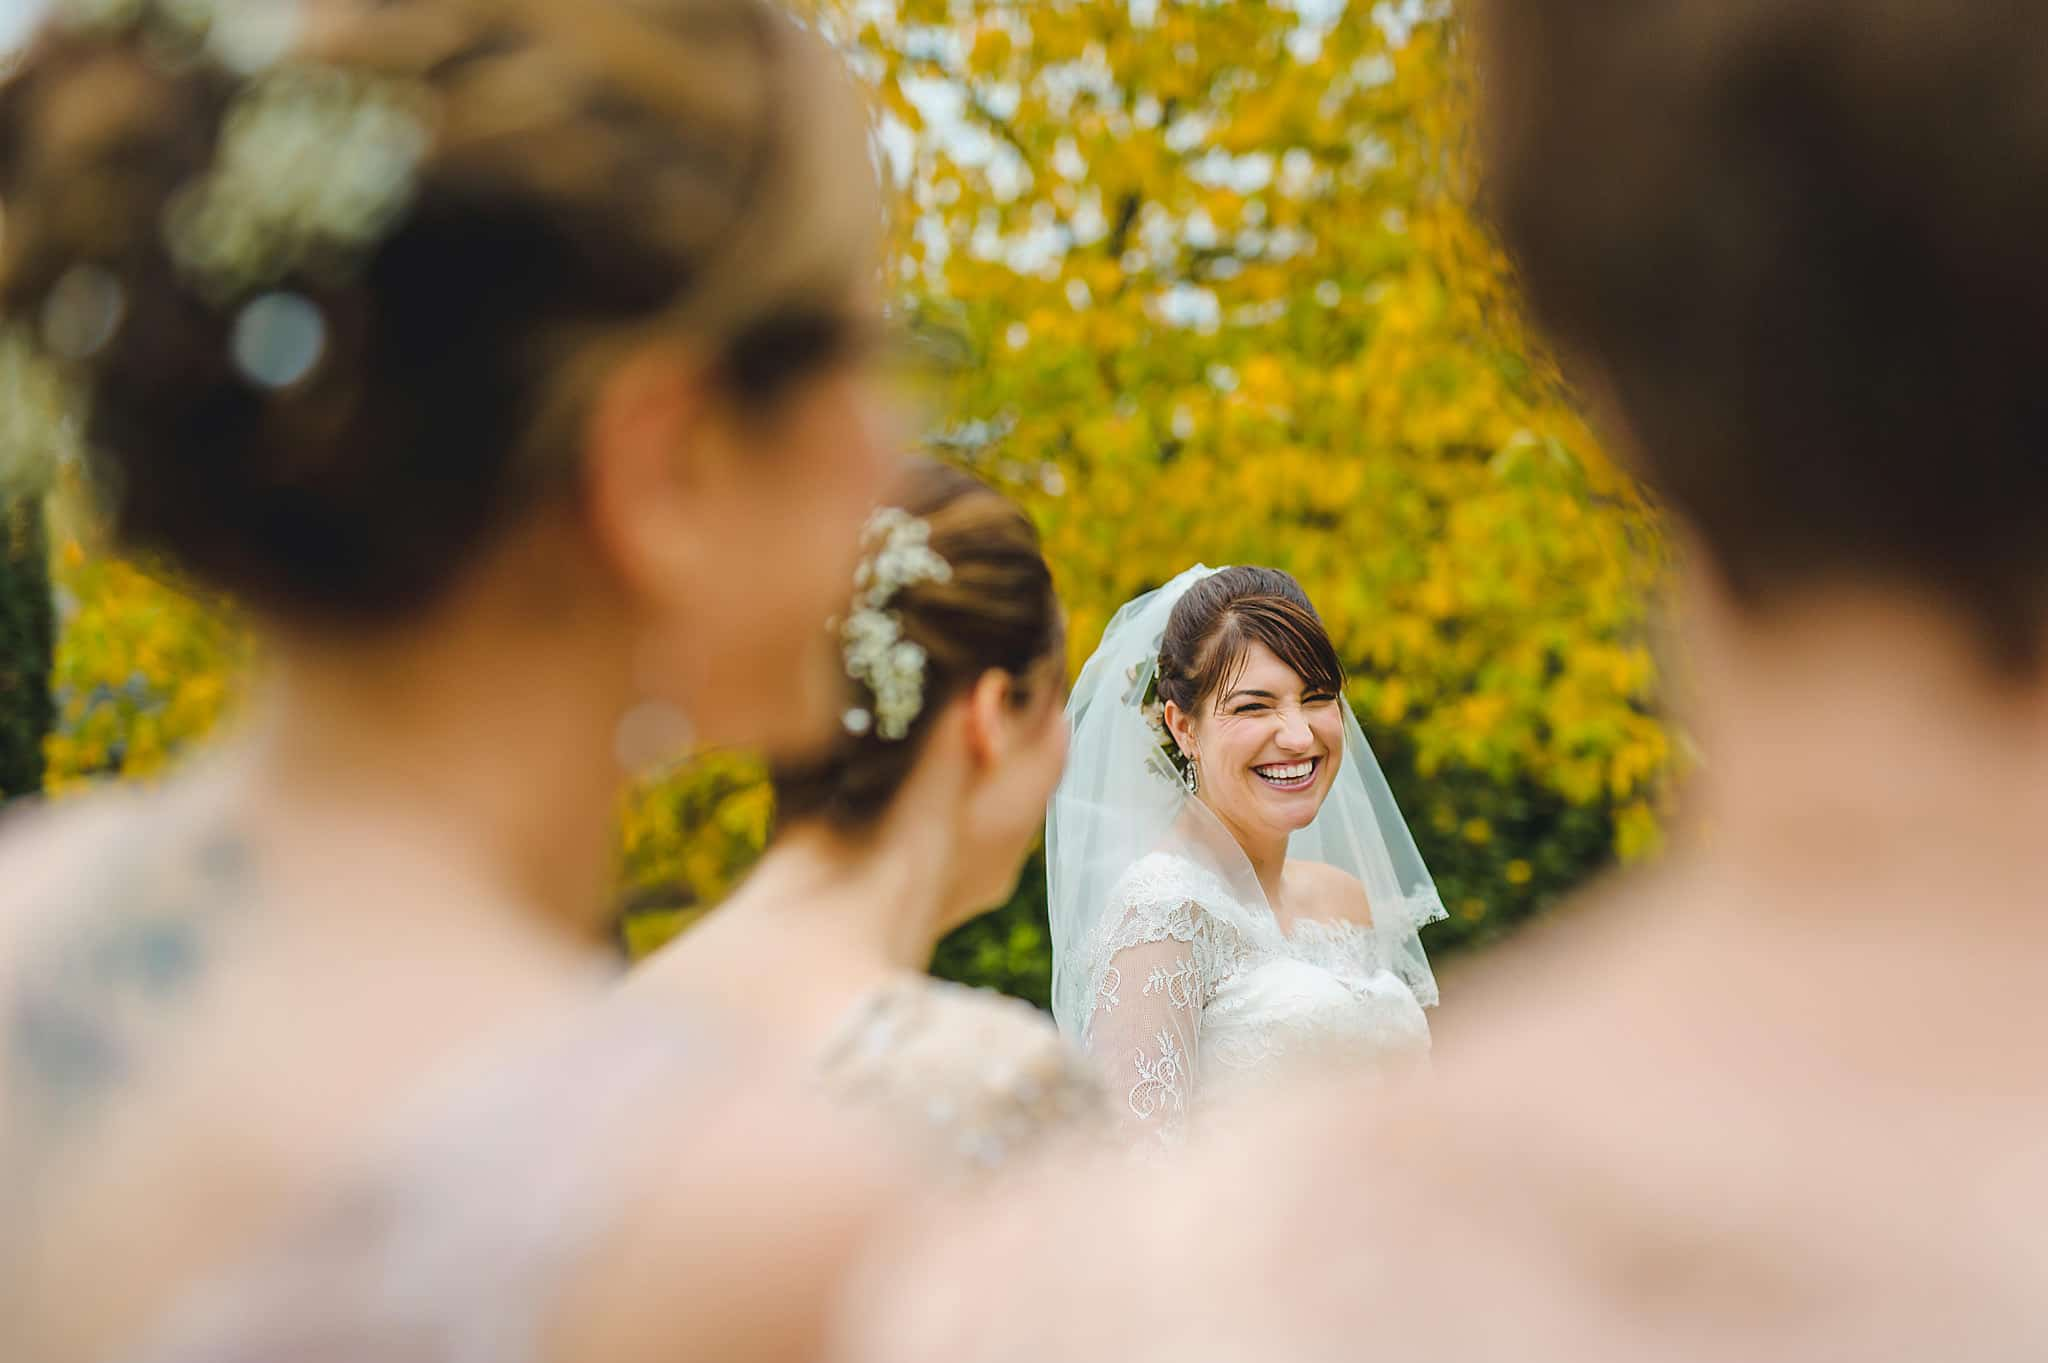 Dewsall Court wedding photography Herefordshire | Laura + Alex 82